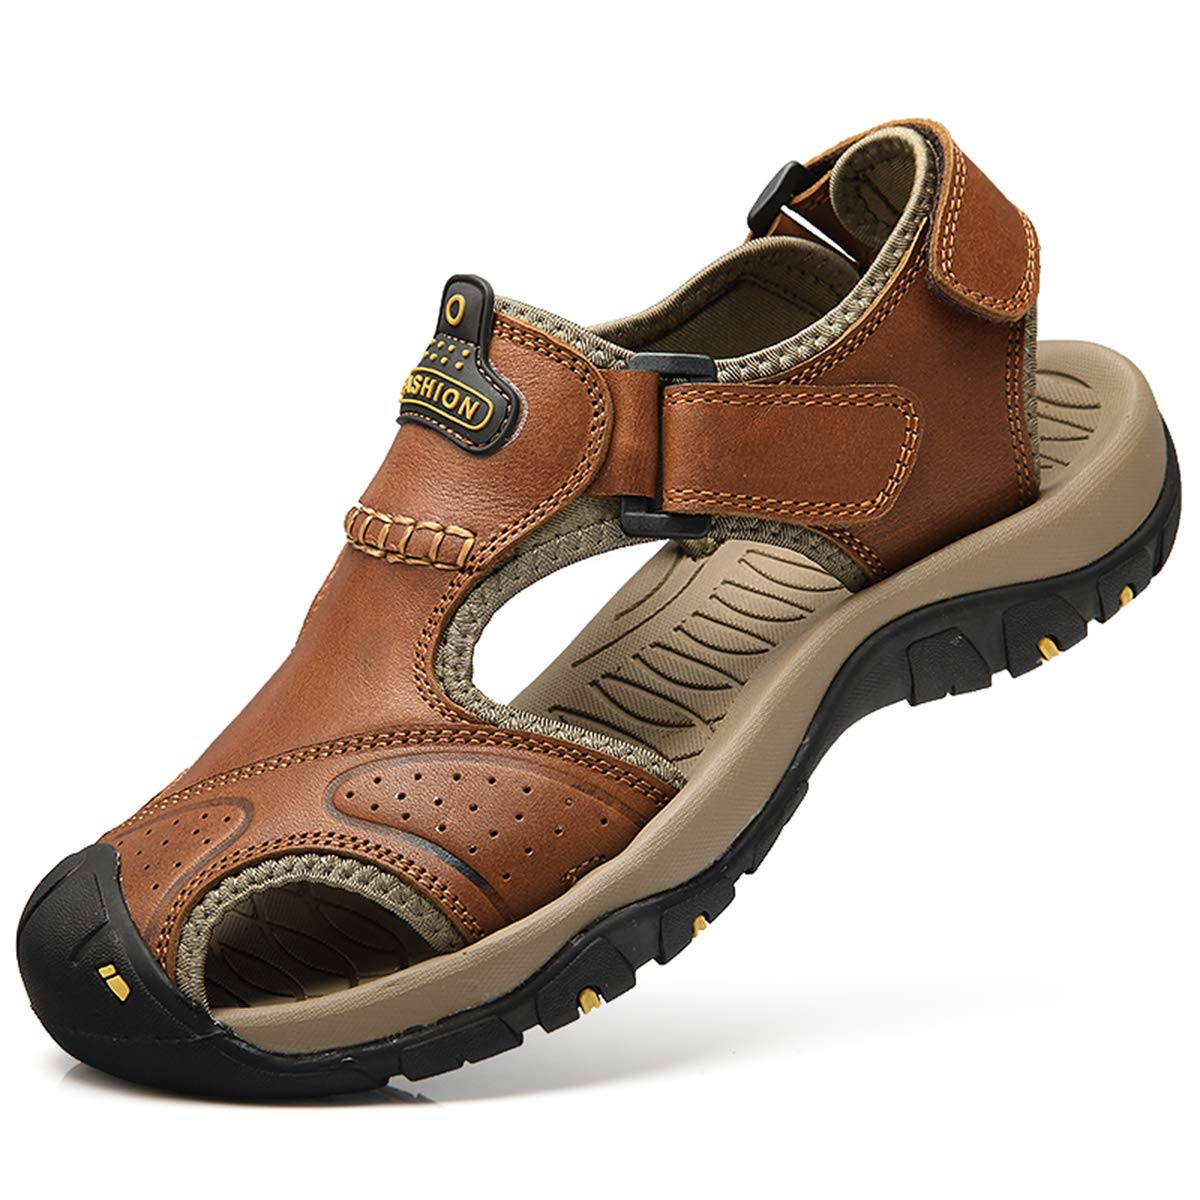 bo li xuan Sandals for Men Leather Closed Toe Sandles Men's Athletic Sports Hiking Fisherman Walking Strap Shoes Brown by bo li xuan